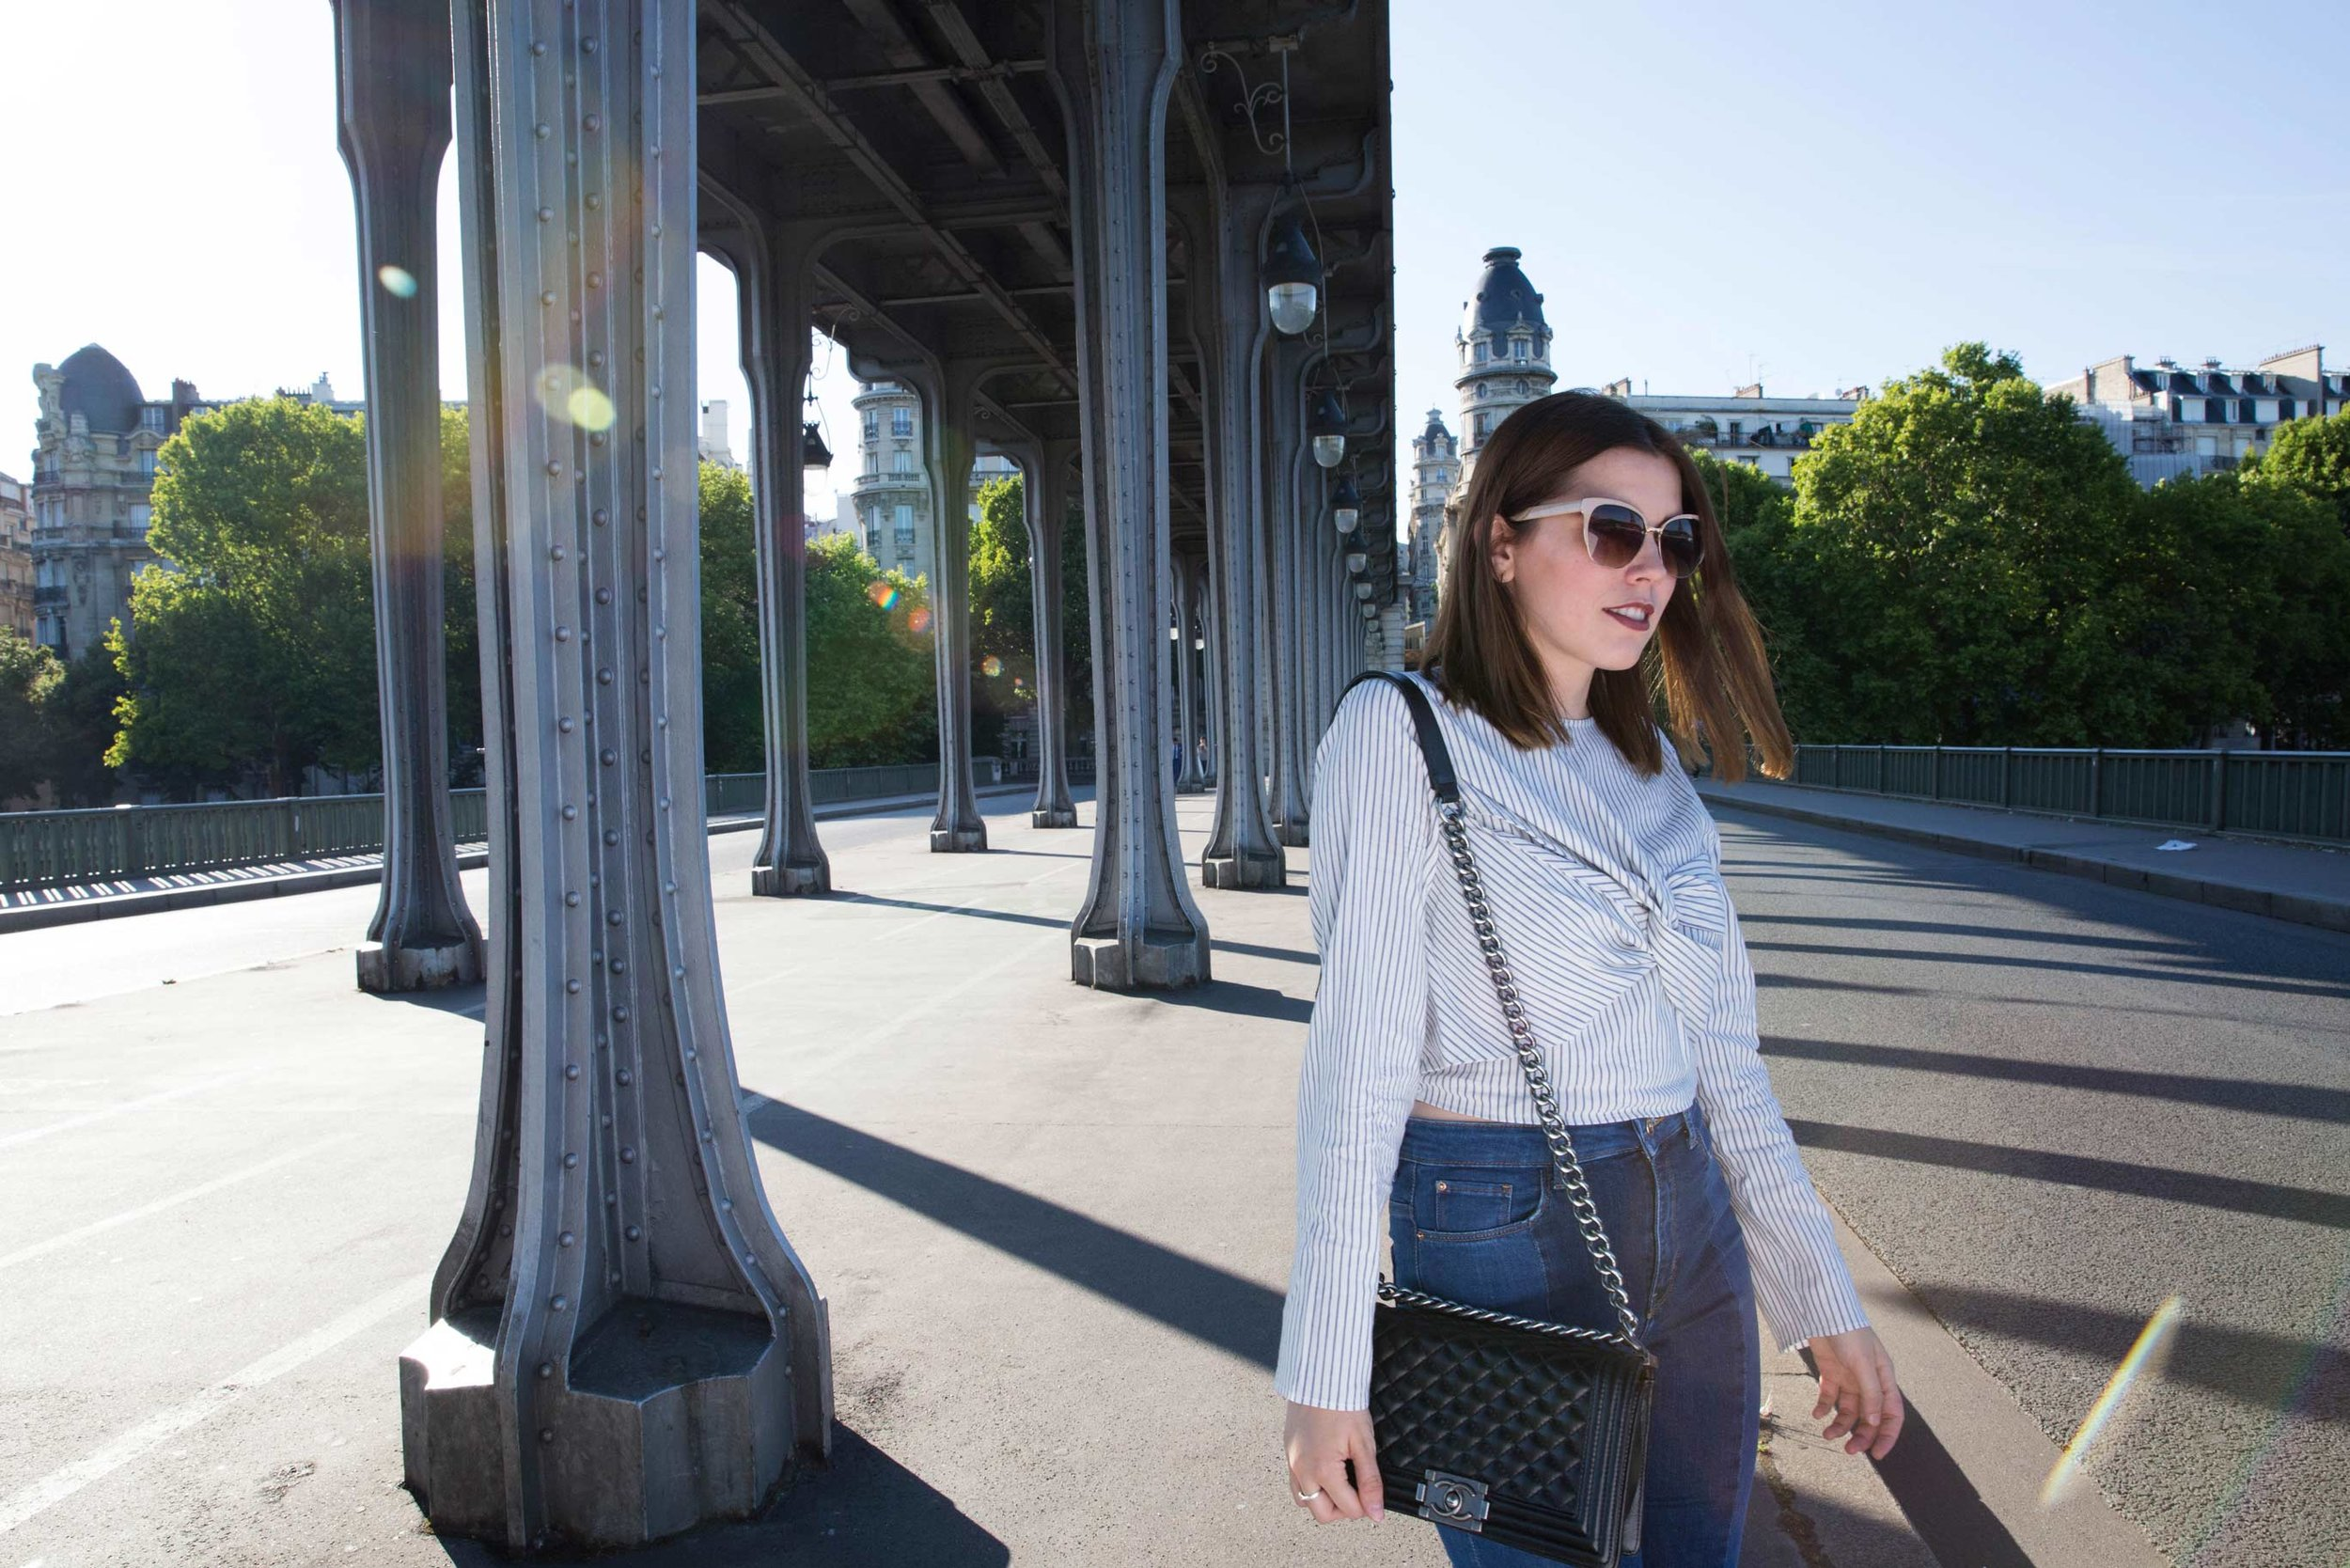 Ines-Aramburo-photographe-paris-portrait-lifestyle-seance-photo-photoshoot-photographer19.jpg